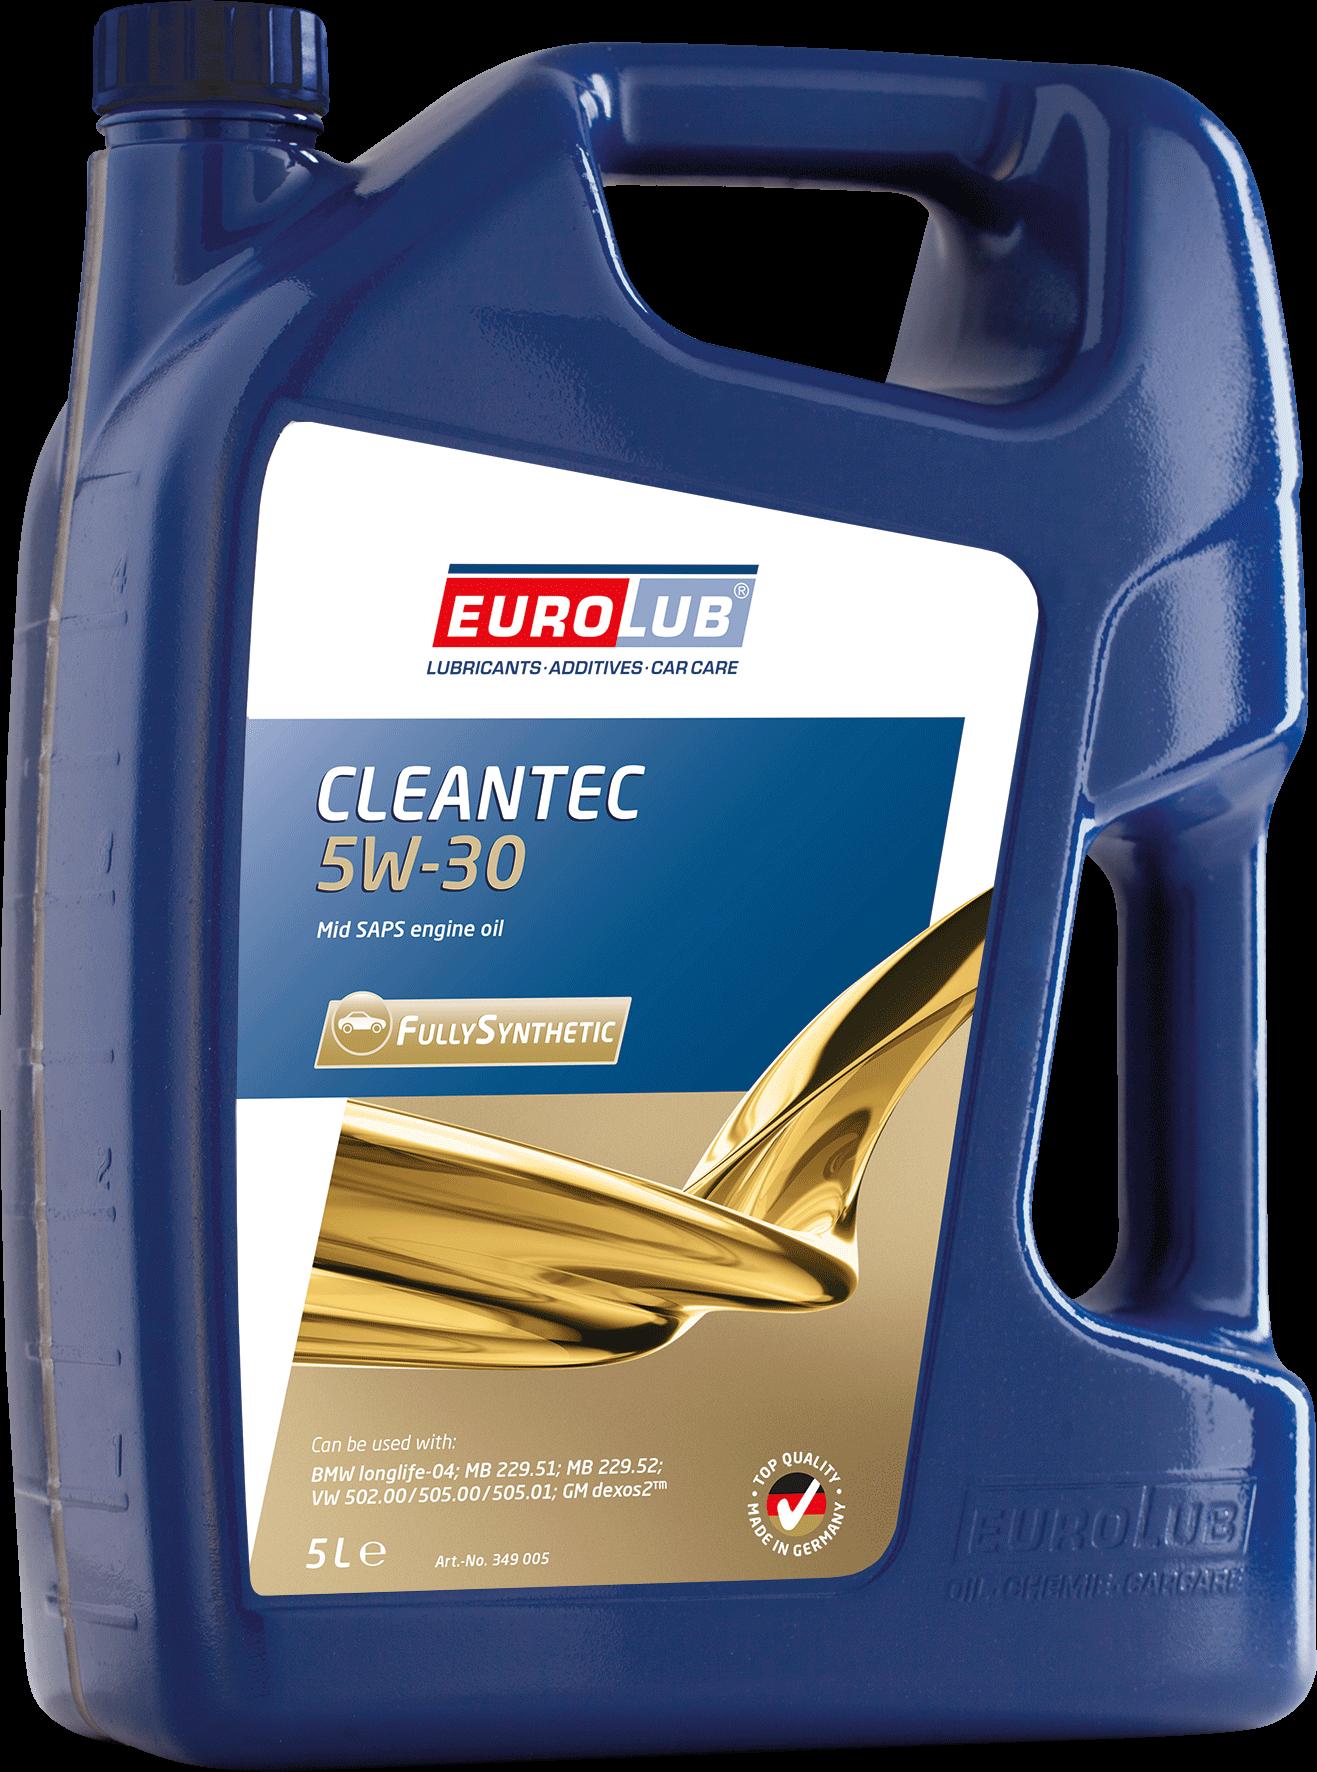 EUROLUB CLEANTEC SAE 5W/30 (синтетическое, Mid SAPS) , 5л